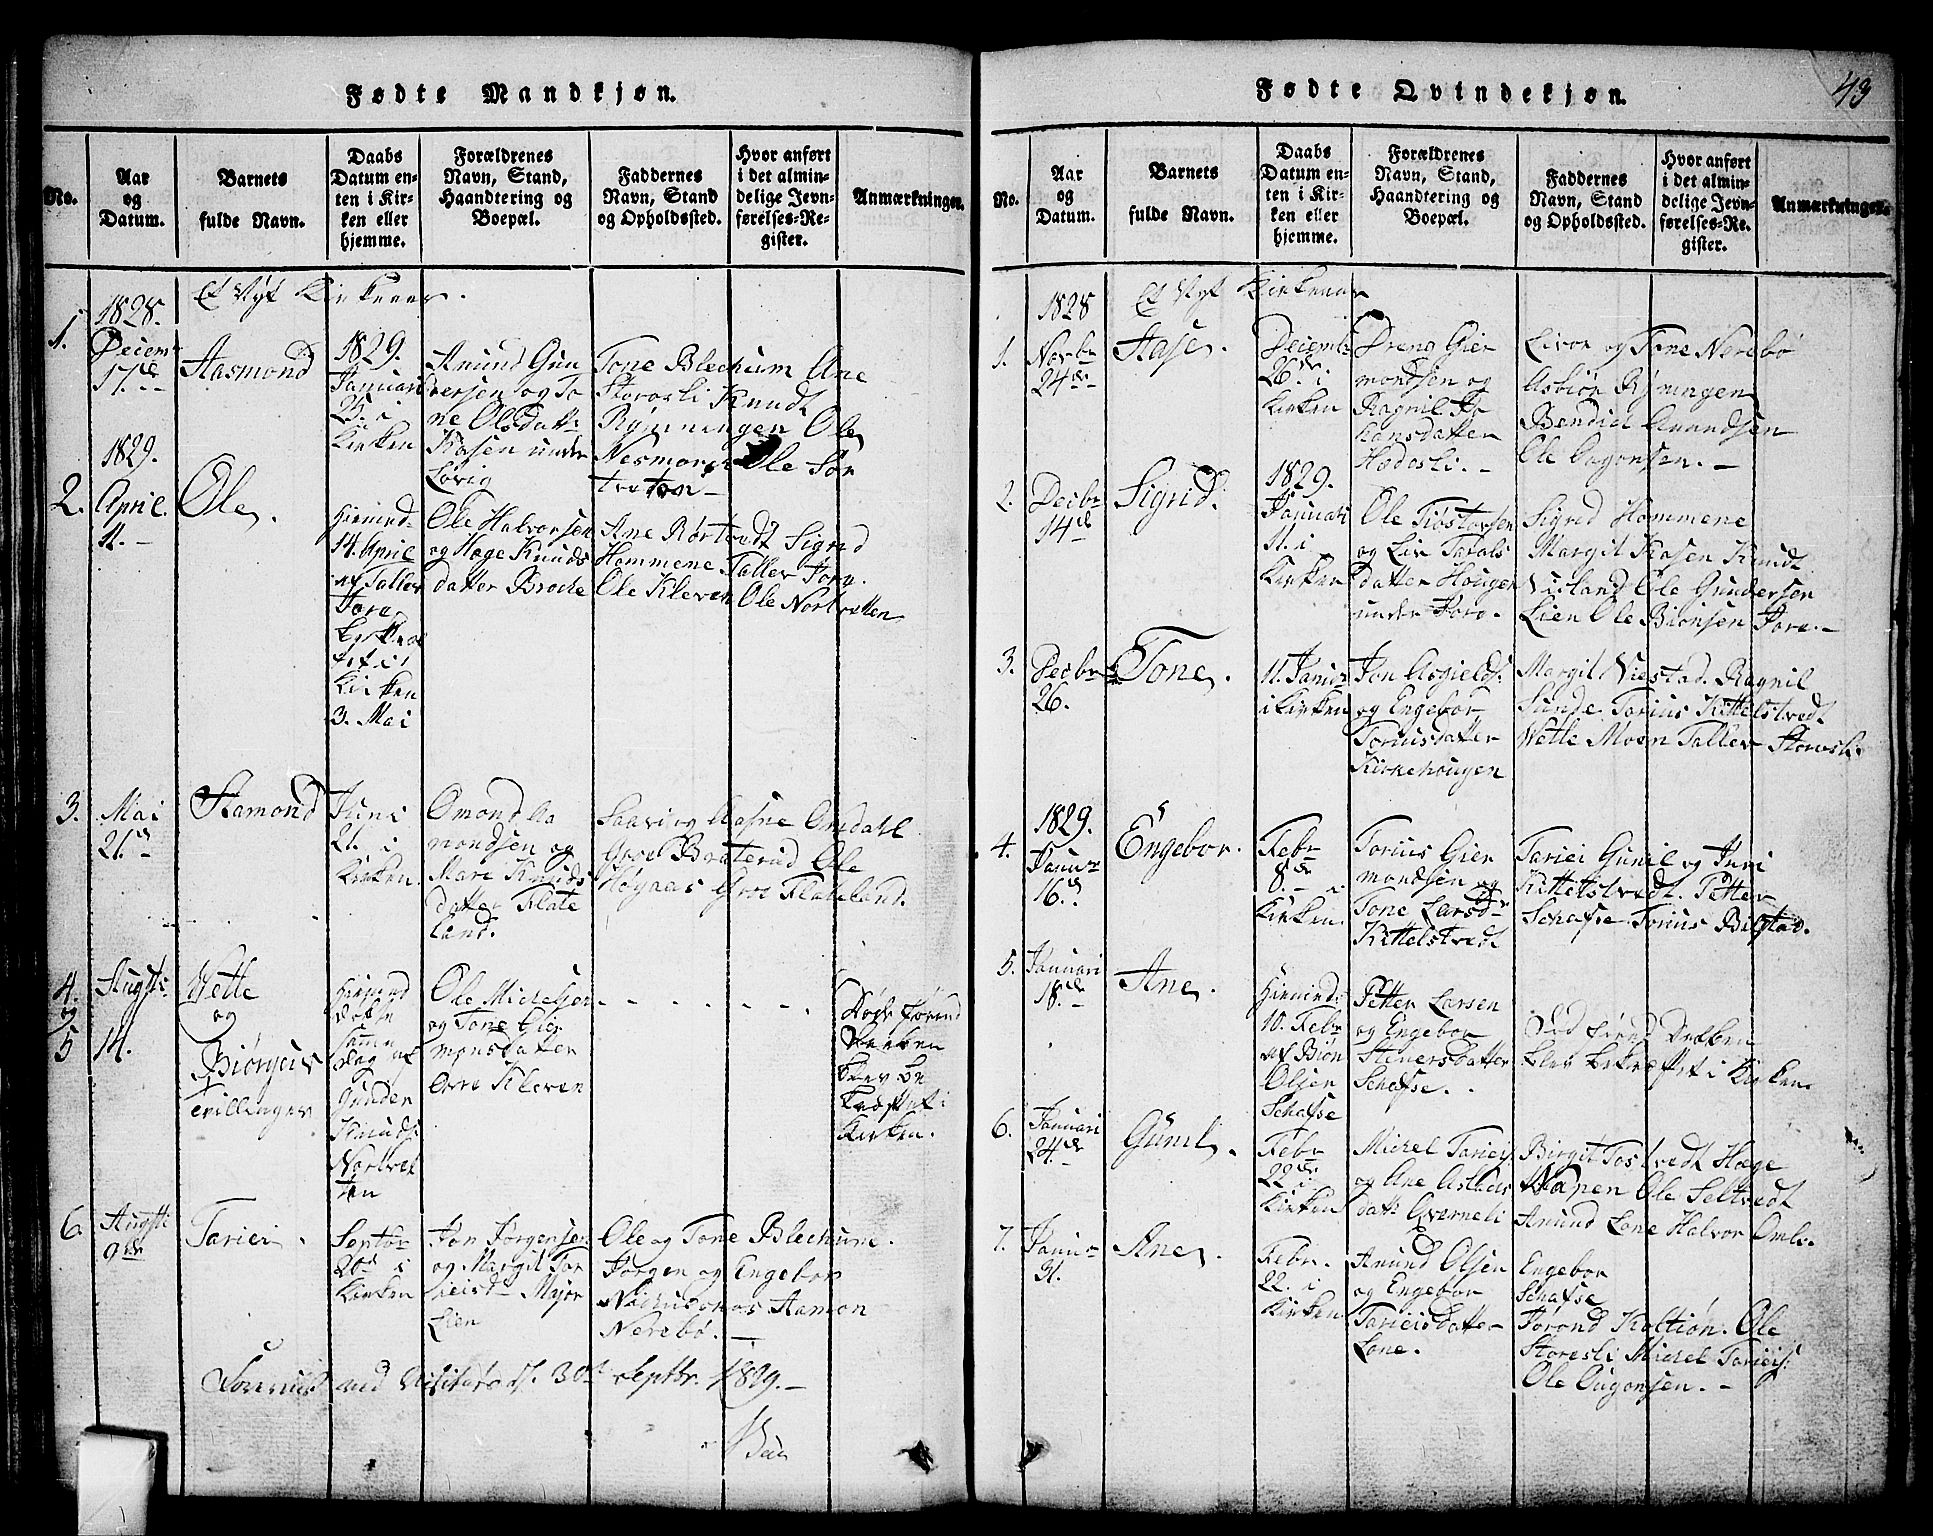 SAKO, Mo kirkebøker, G/Gb/L0001: Klokkerbok nr. II 1, 1814-1843, s. 43